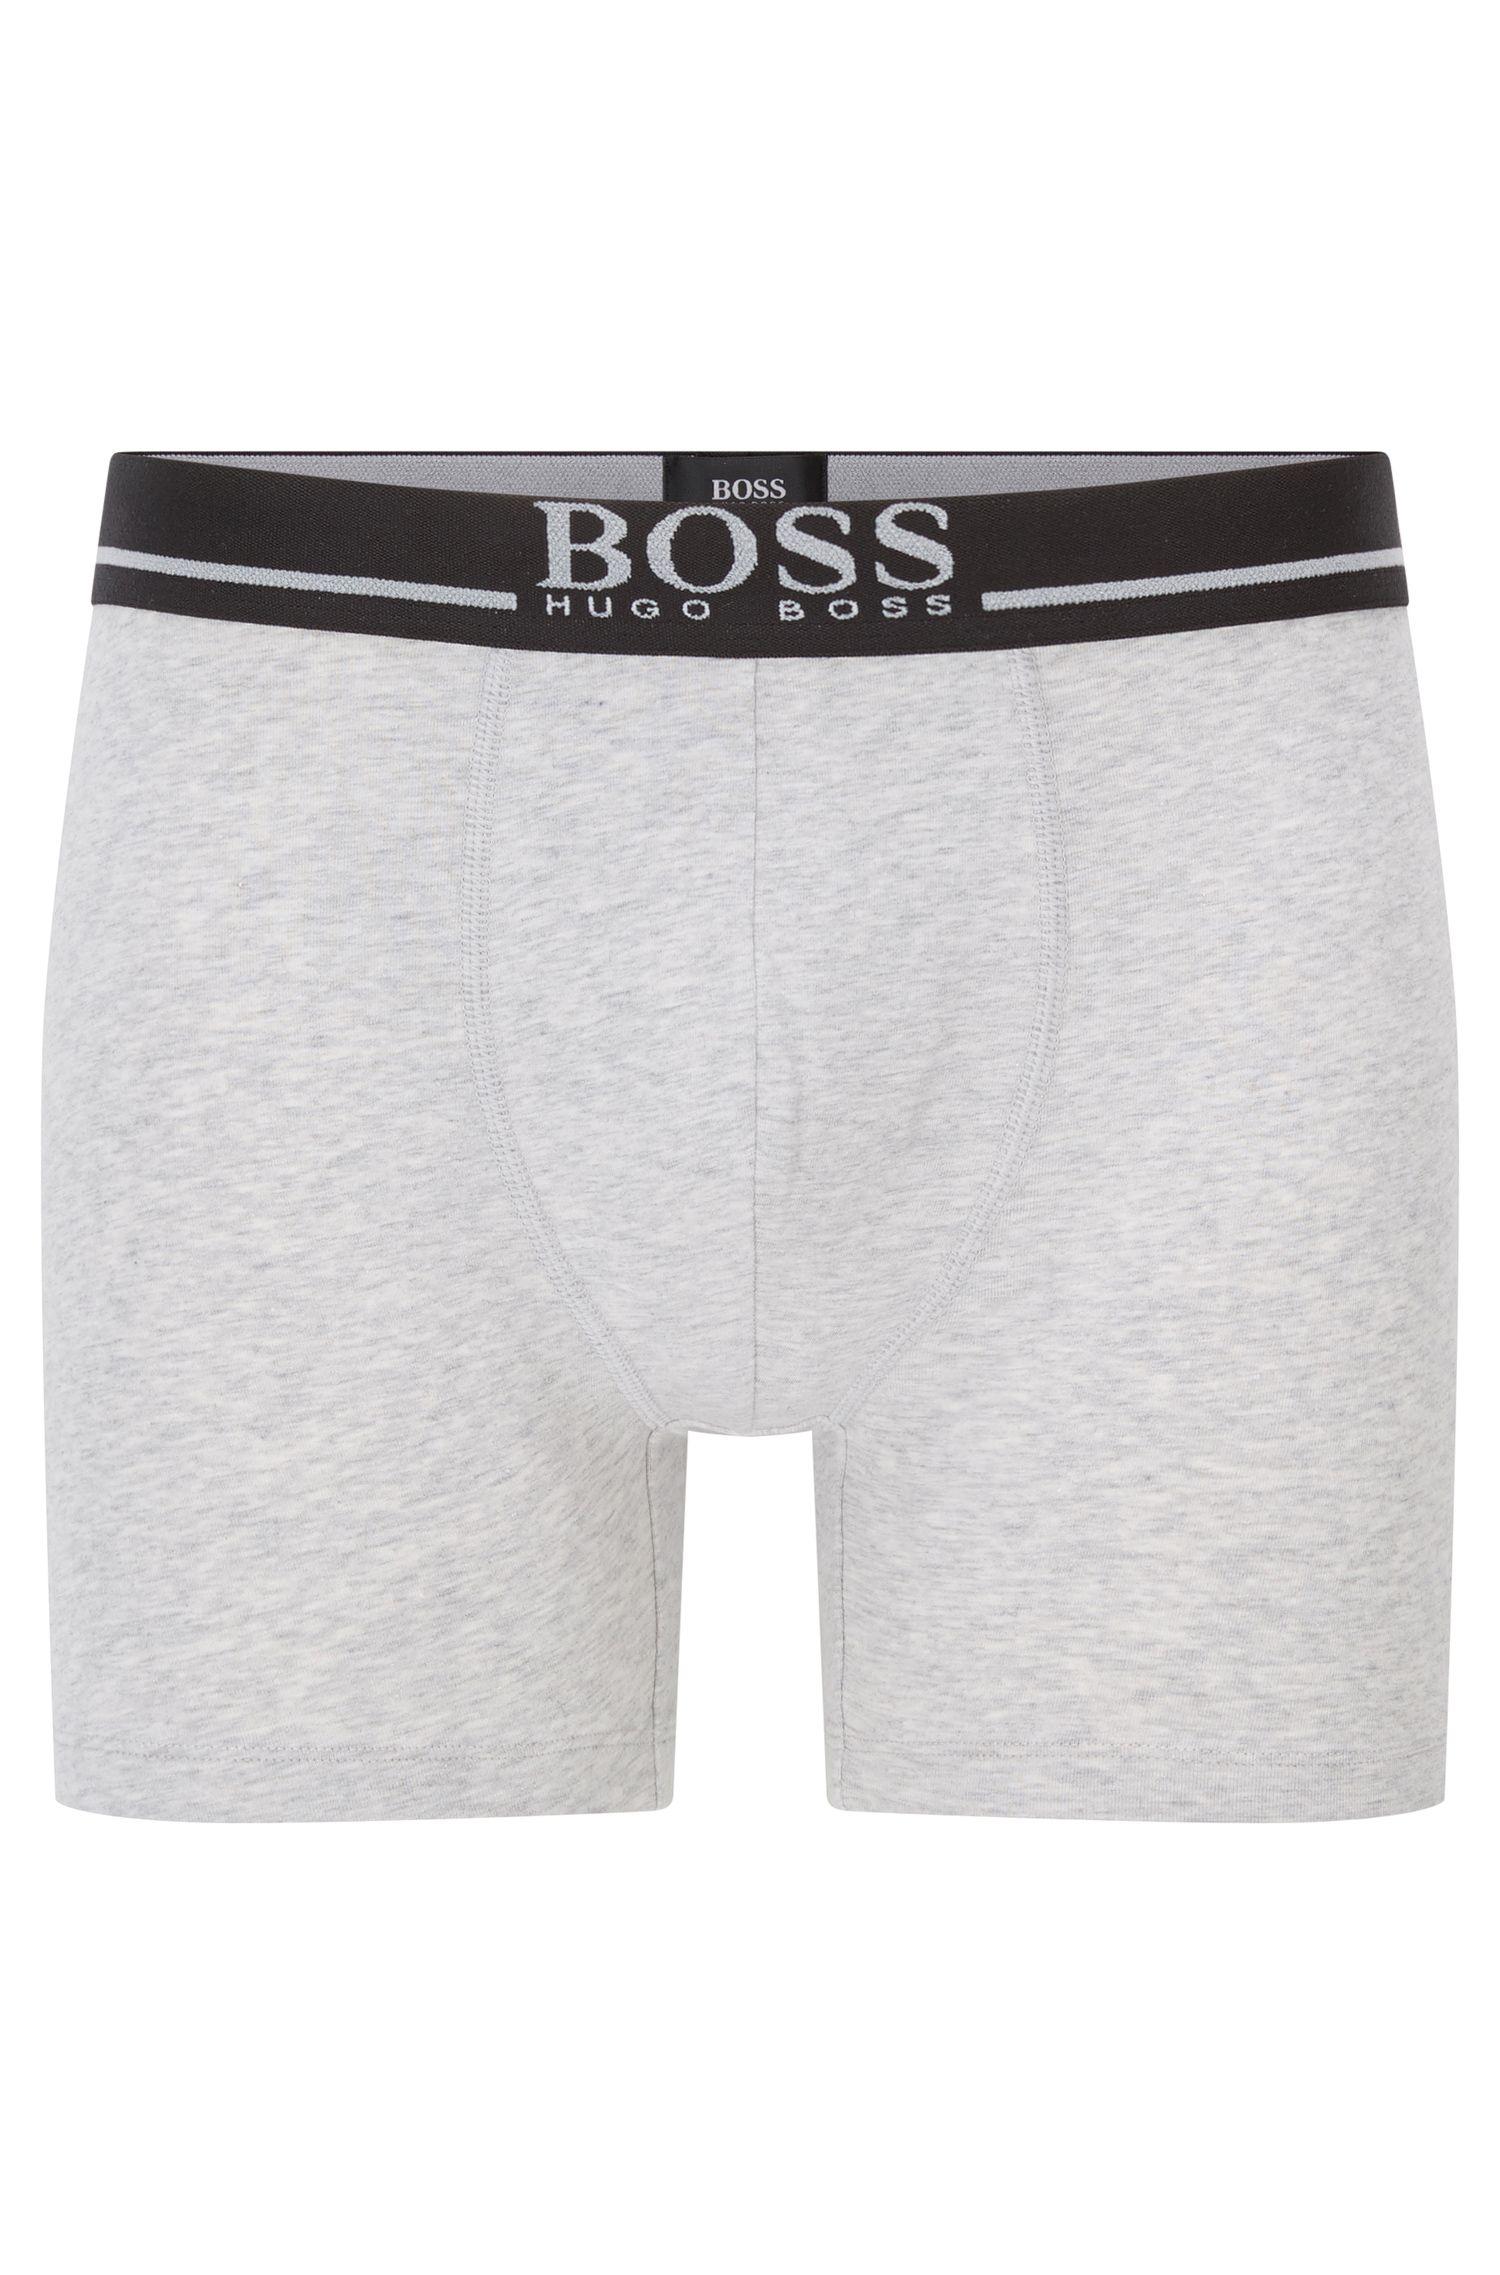 Stretch Cotton Boxer Brief | Boxer Brief 24 Logo, Grey